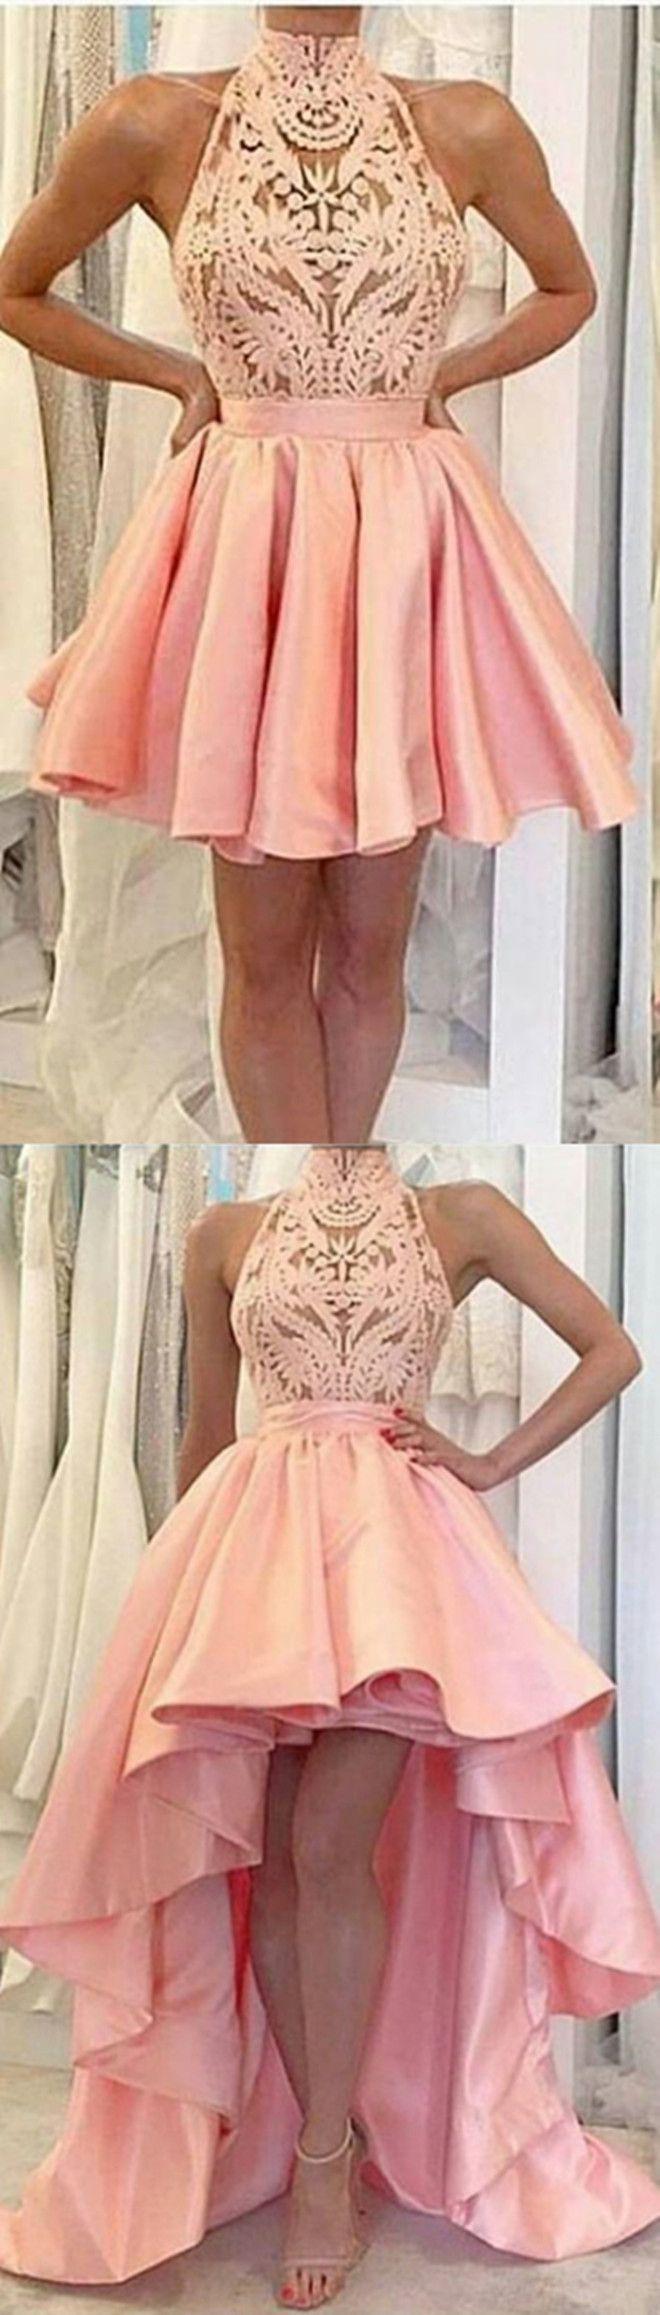 2017 homecoming dresses,pink homecoming dresses,unique homecoming dresses,high low homecoming dresses @simpledress2480